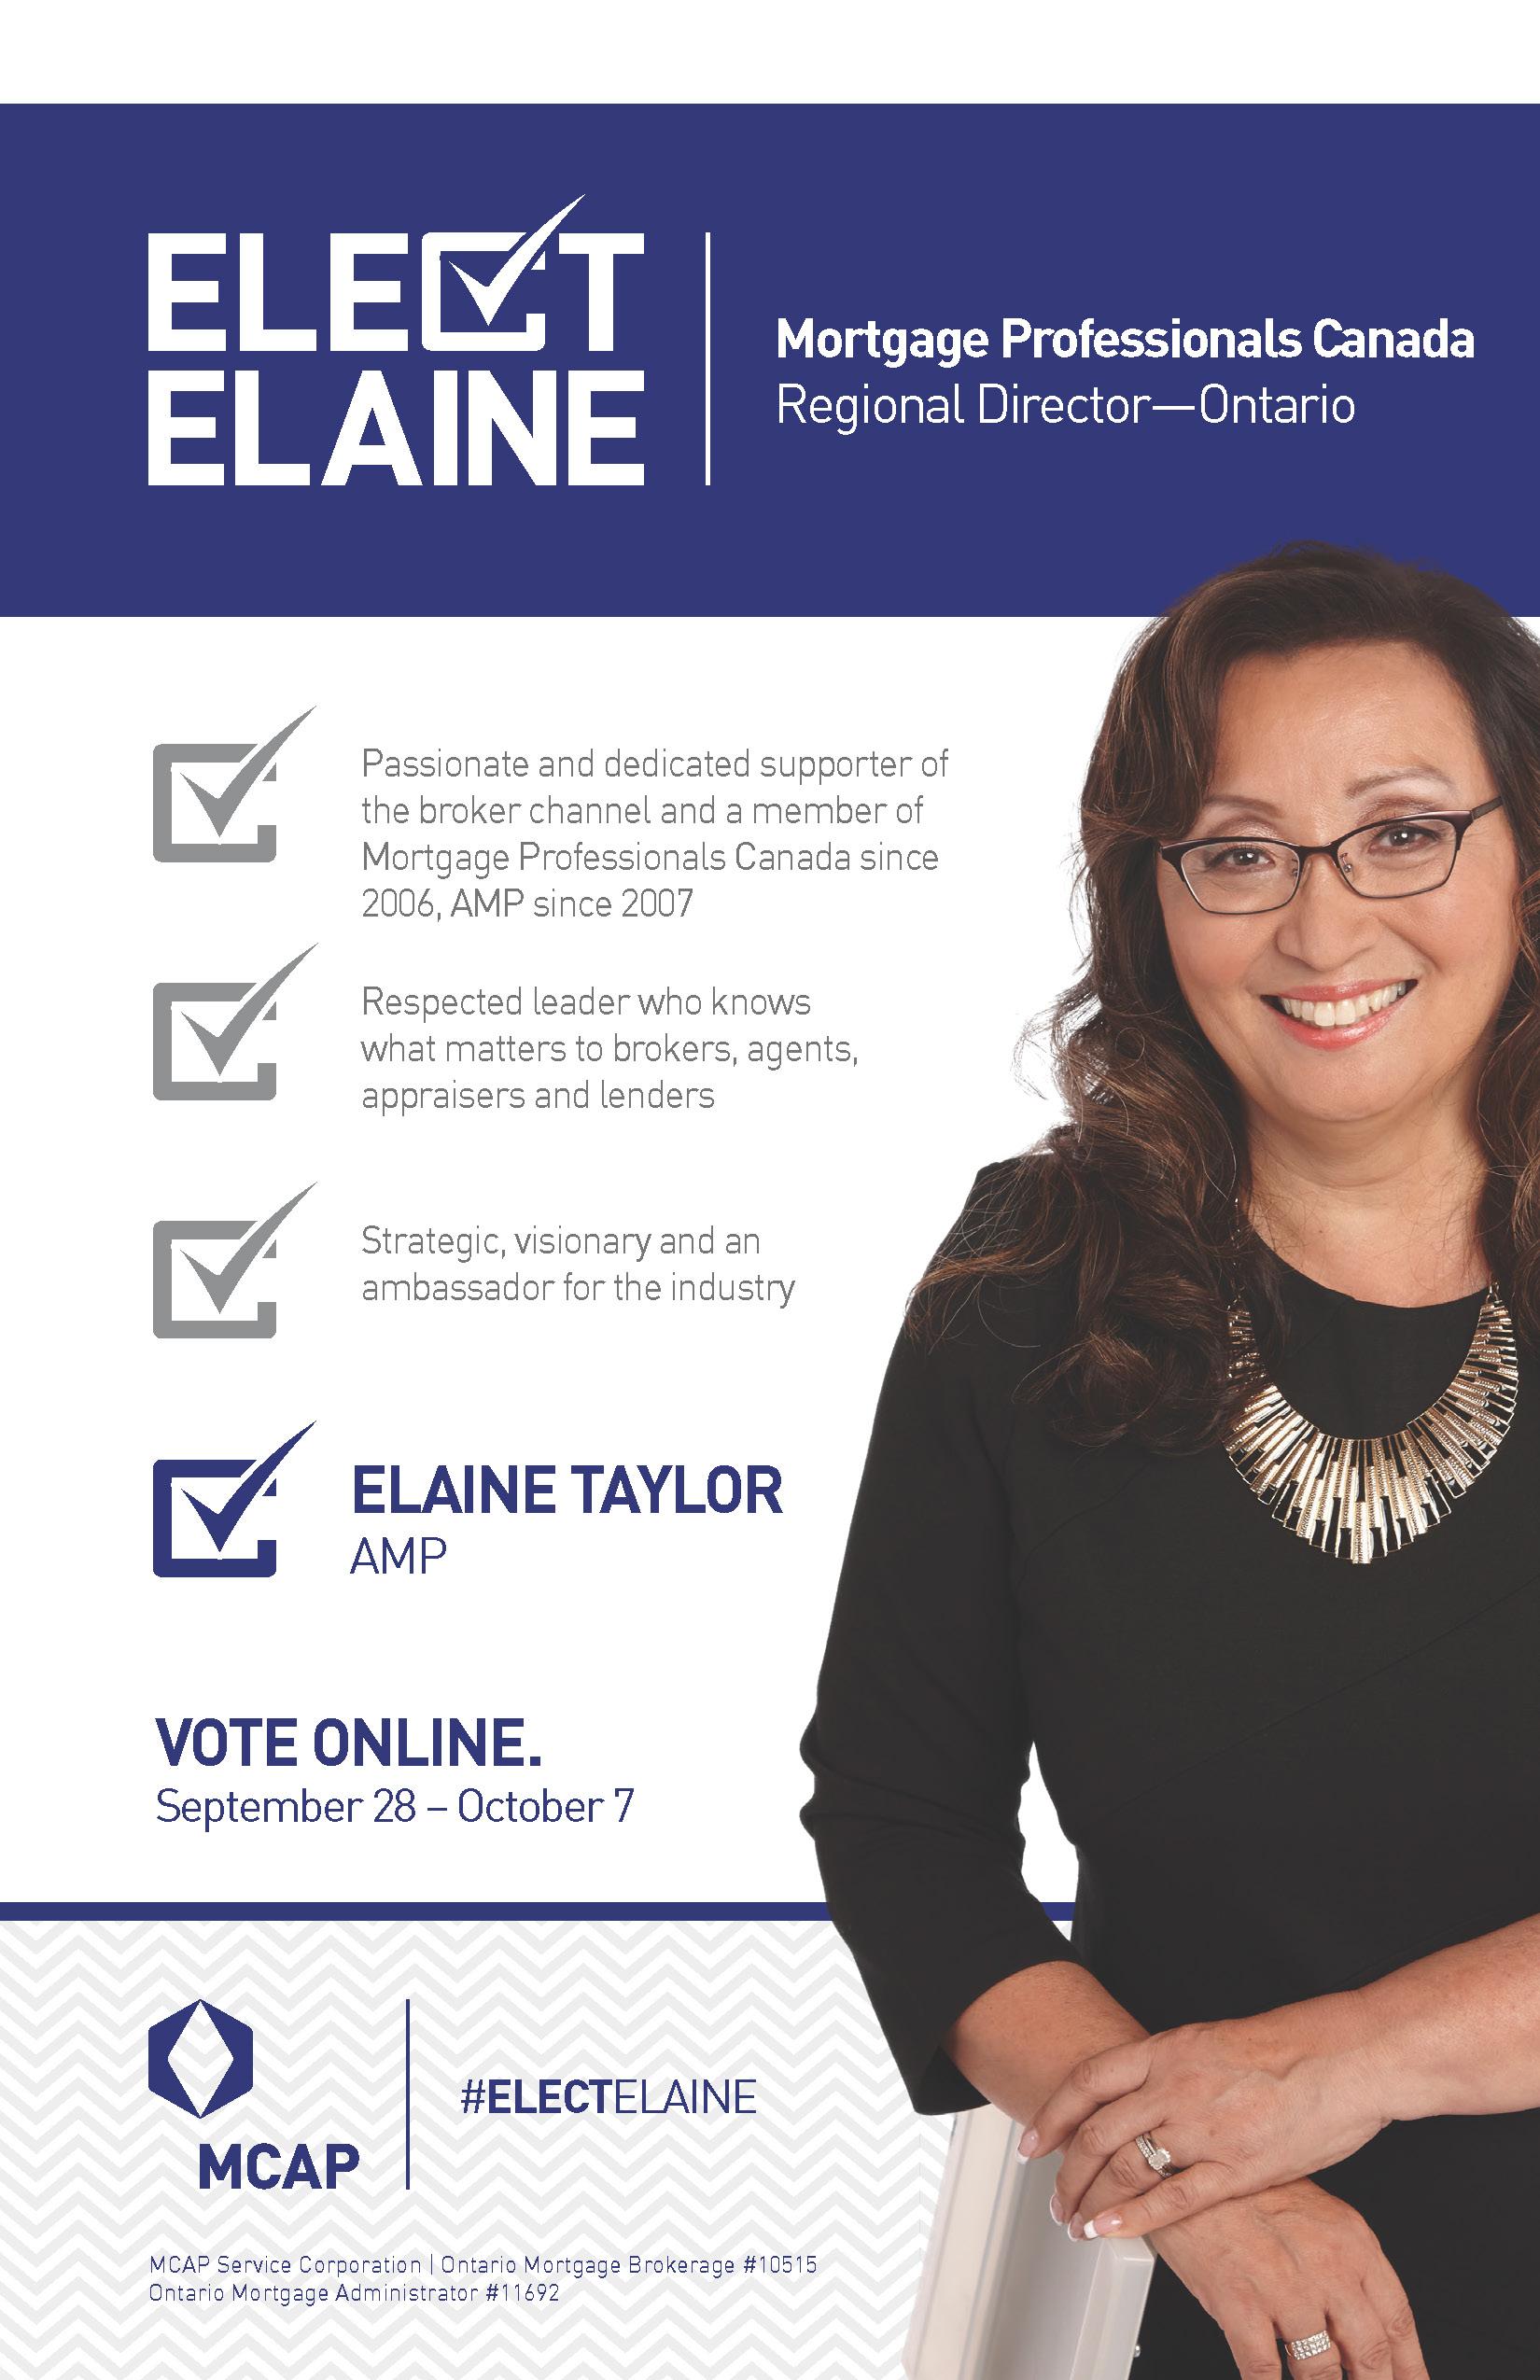 Copy of Elect Elaine Campaign Creative